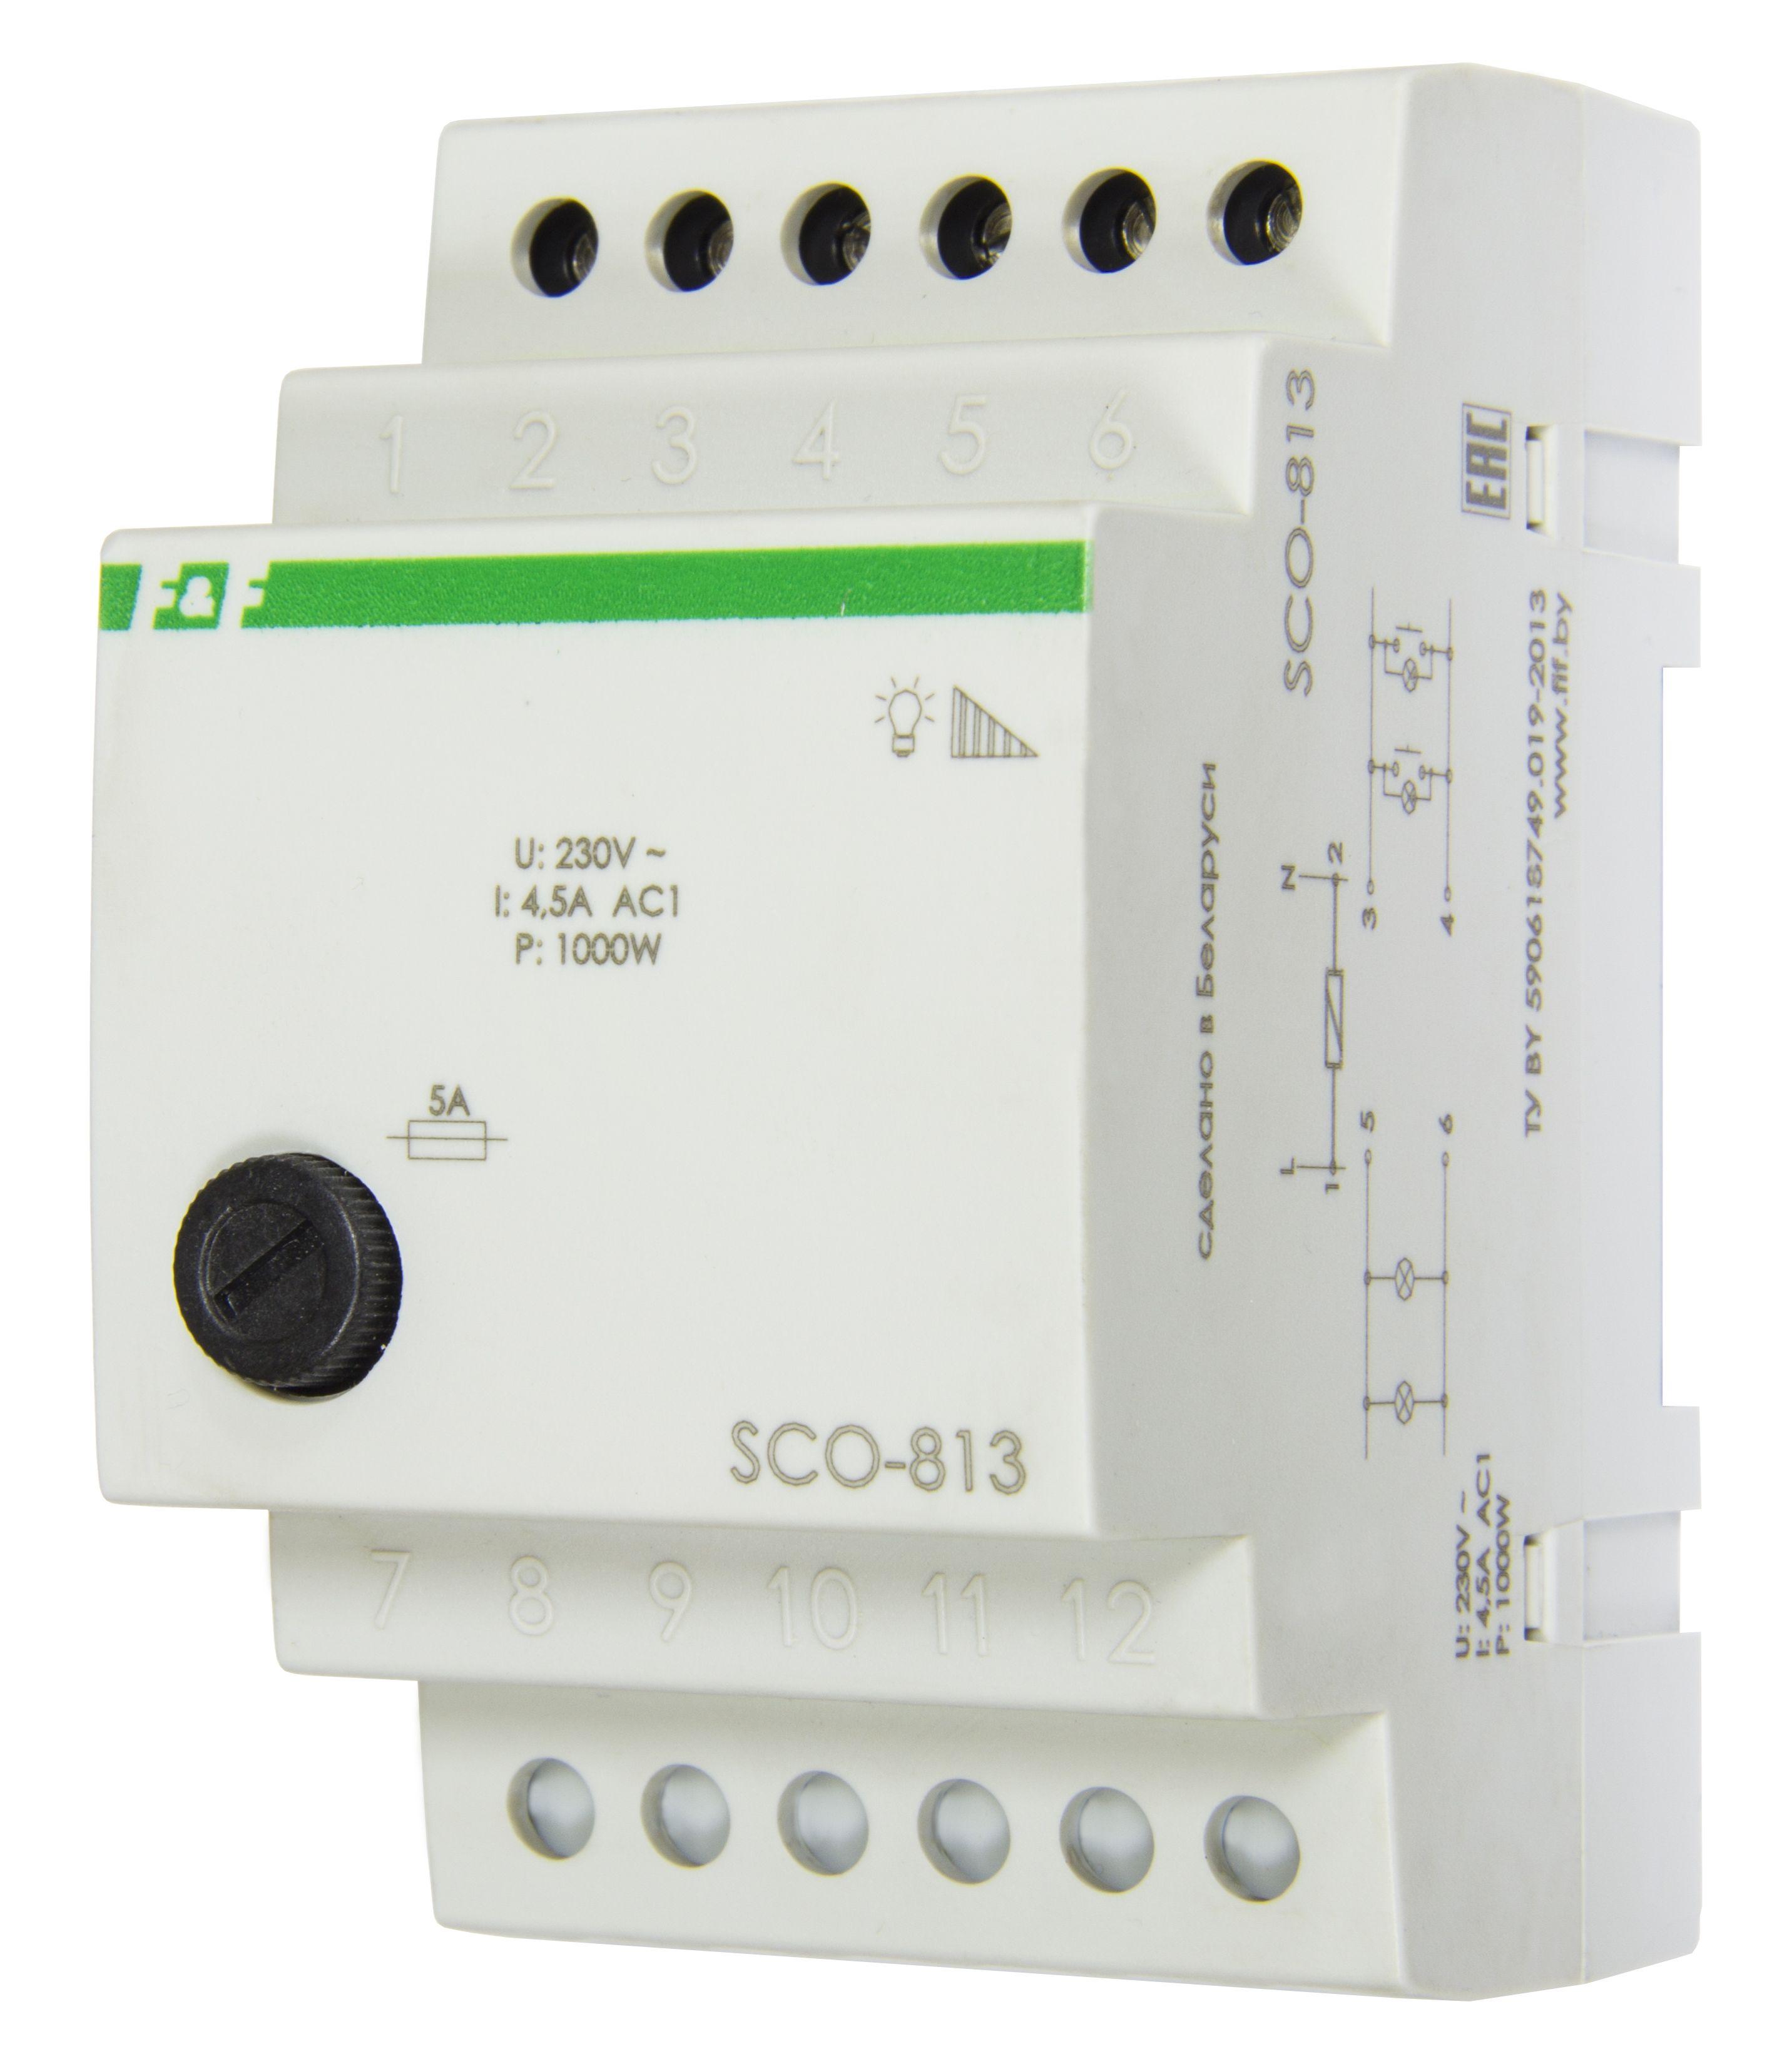 Регулятор освещения SCO-813 монтаж на DIN-рейке 35мм 4, 5А, 220В, Евроавтоматика ФиФ  - Купить